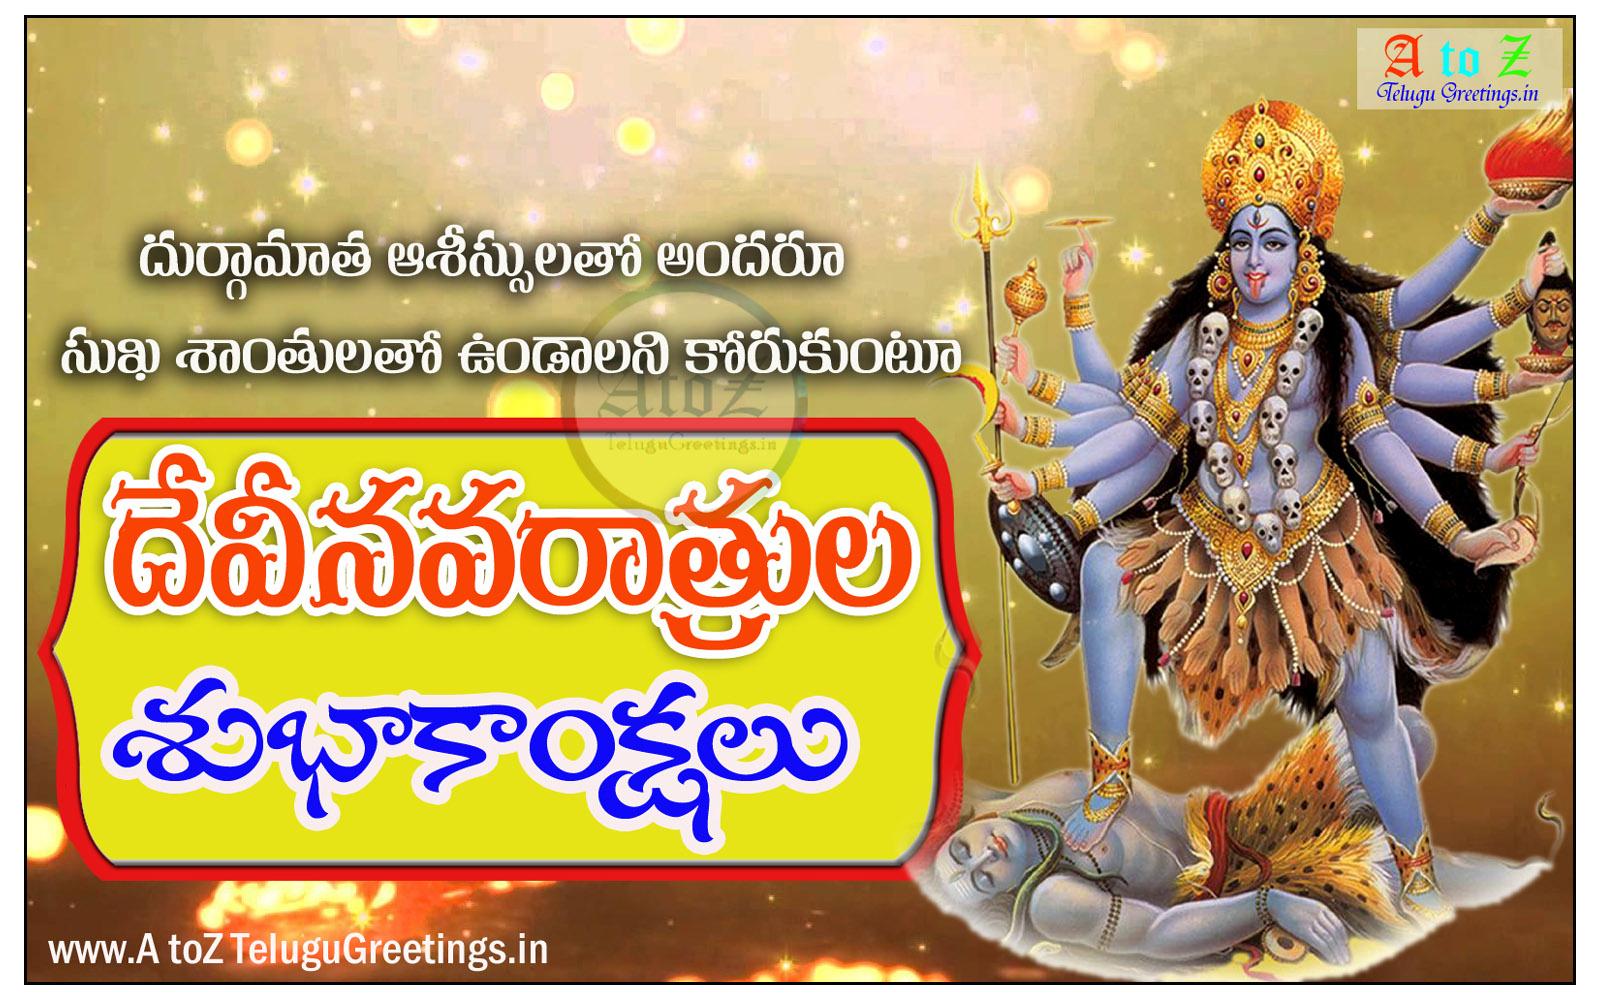 Dasara greeting cards happy dasara cards dussehra greeting cards dasara greeting cards happy dasara cards dussehra greeting cards vijaya dasami greetings greeting cards kristyandbryce Images